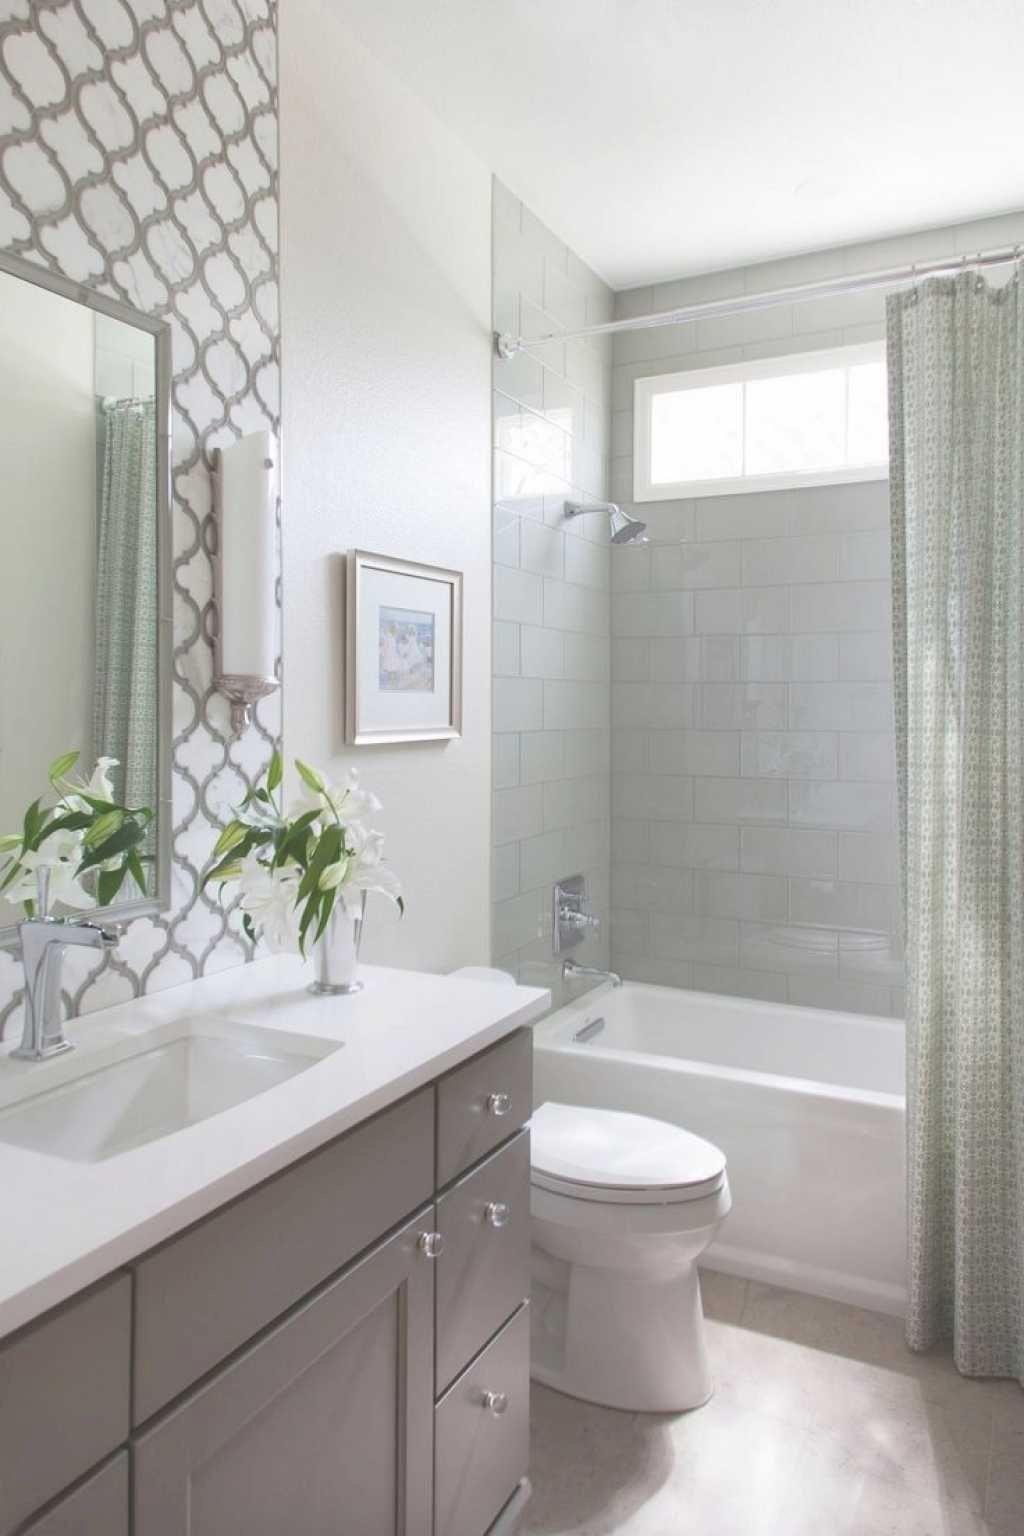 nice 111 brilliant small bathroom remodel ideas on a on bathroom renovation ideas on a budget id=65926